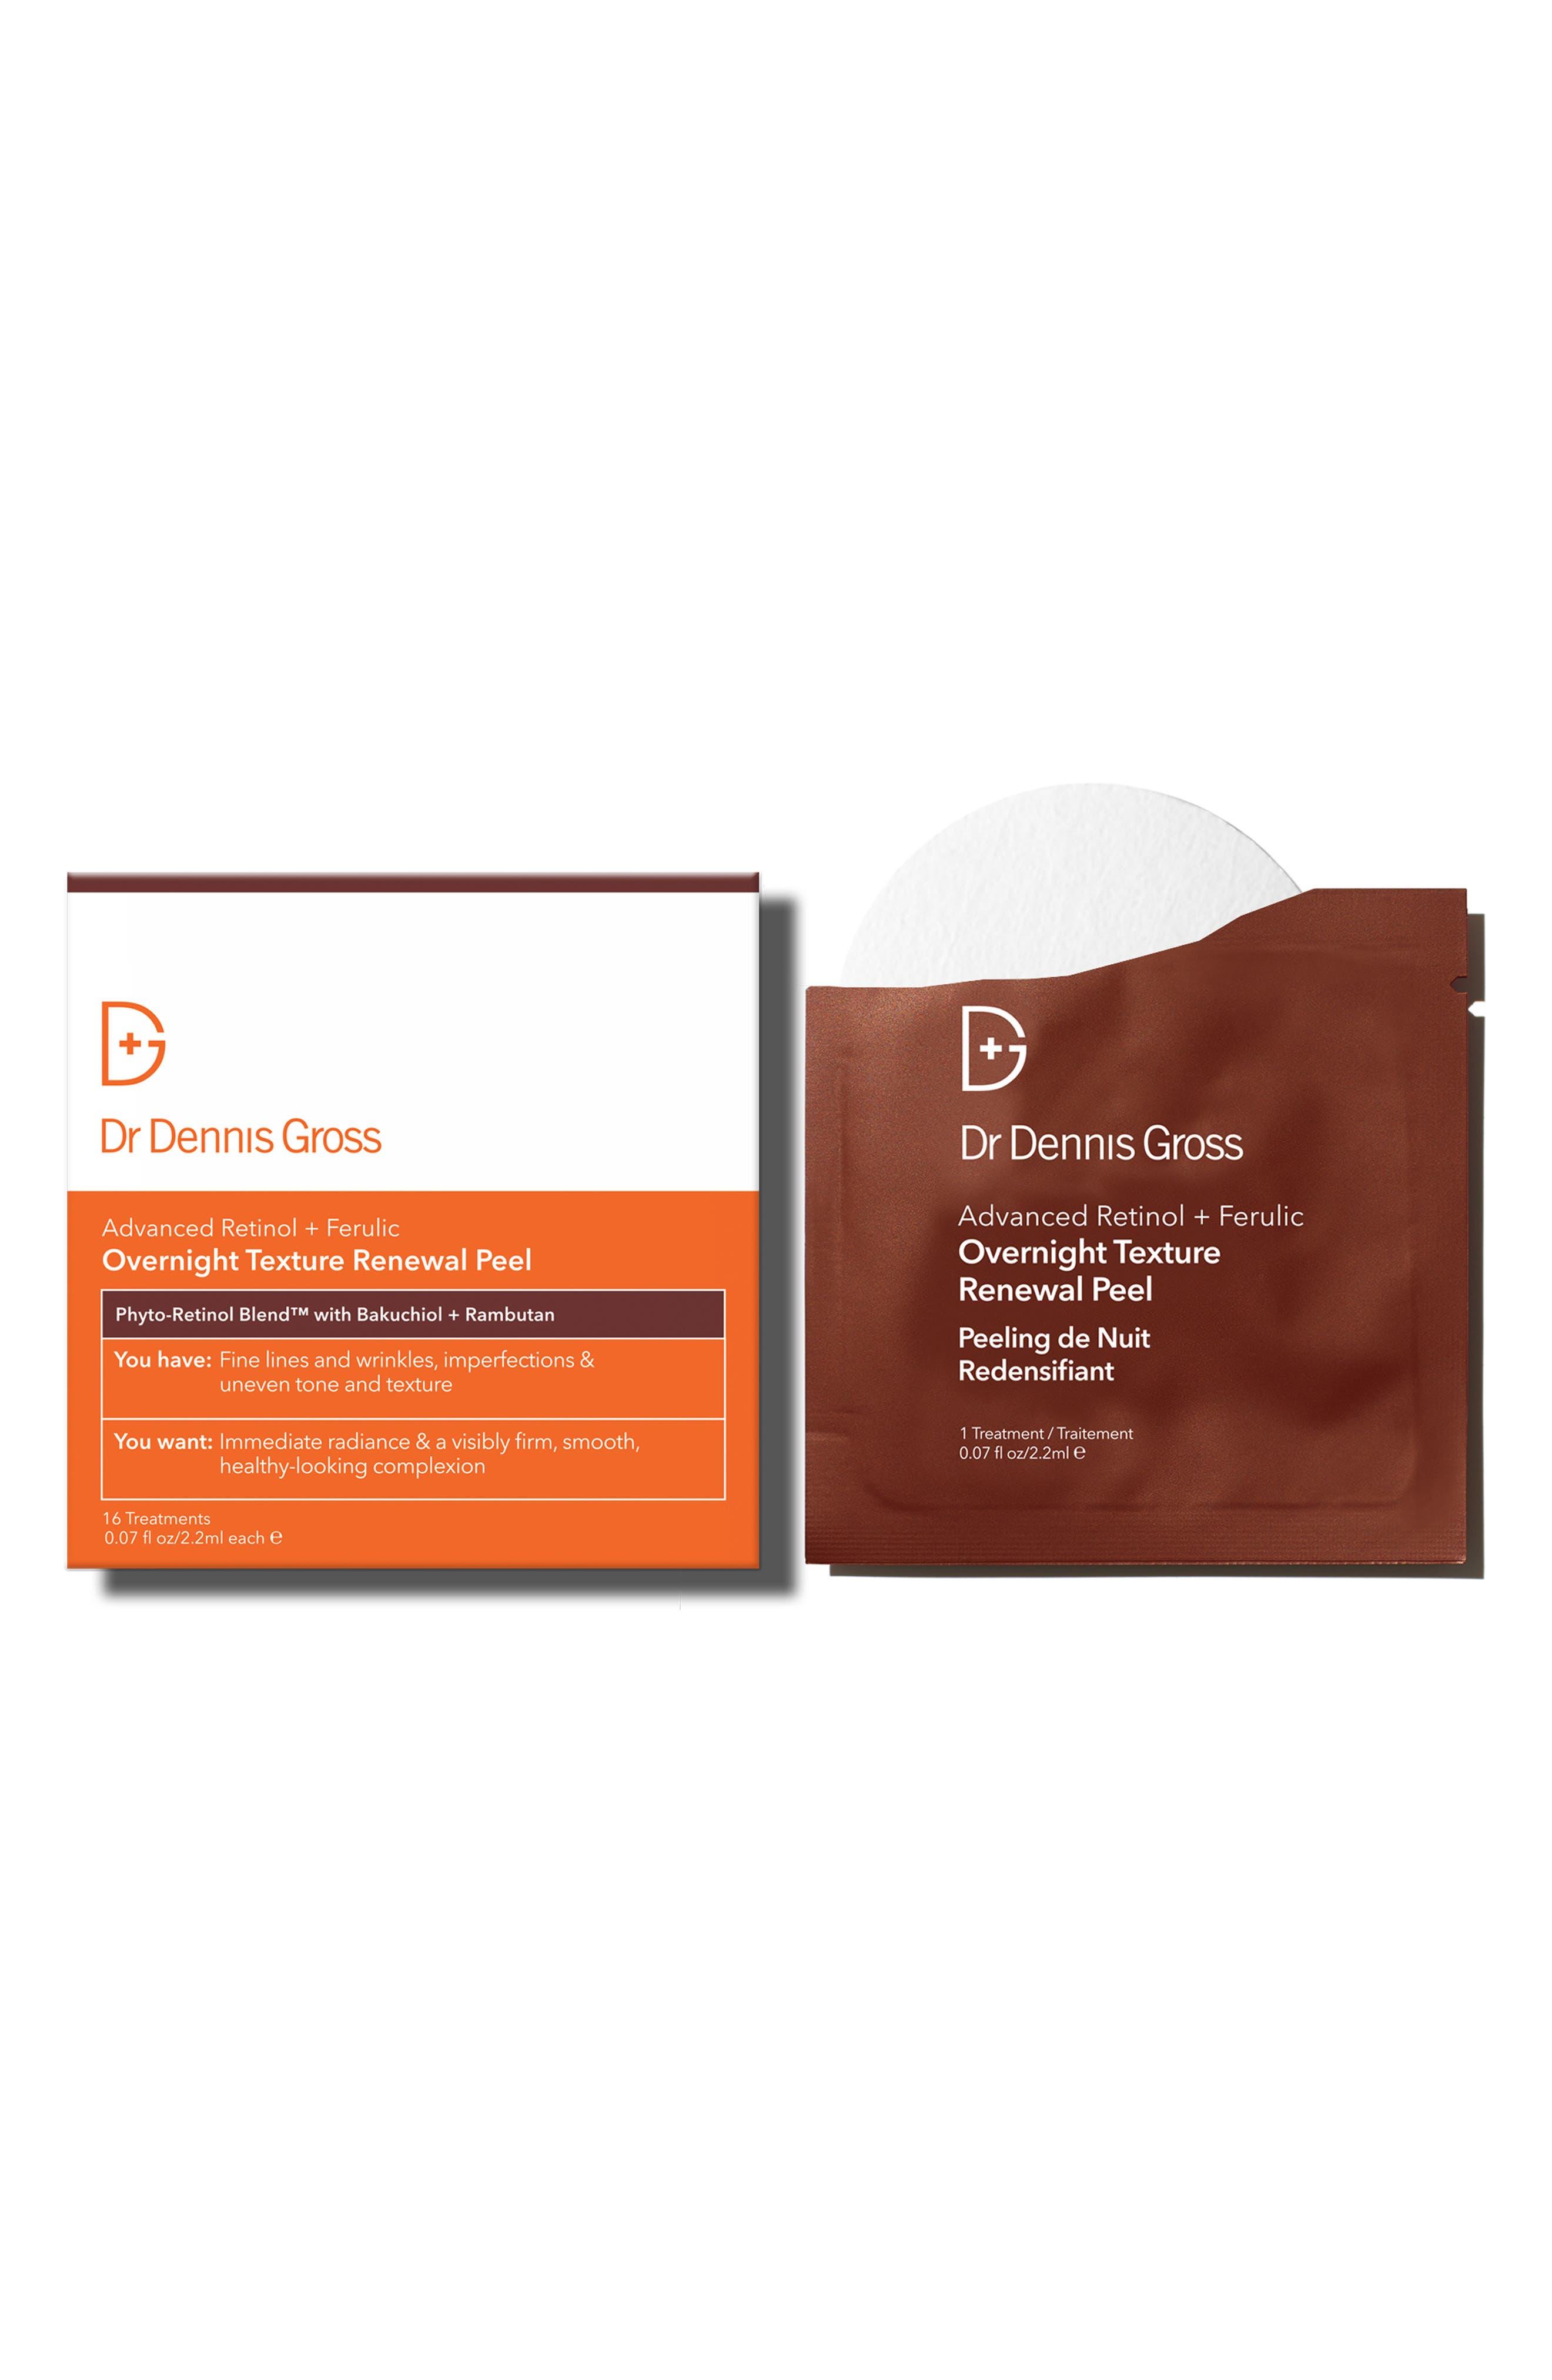 Skincare Advanced Retinol + Ferulic Overnight Texture Renewal Peel